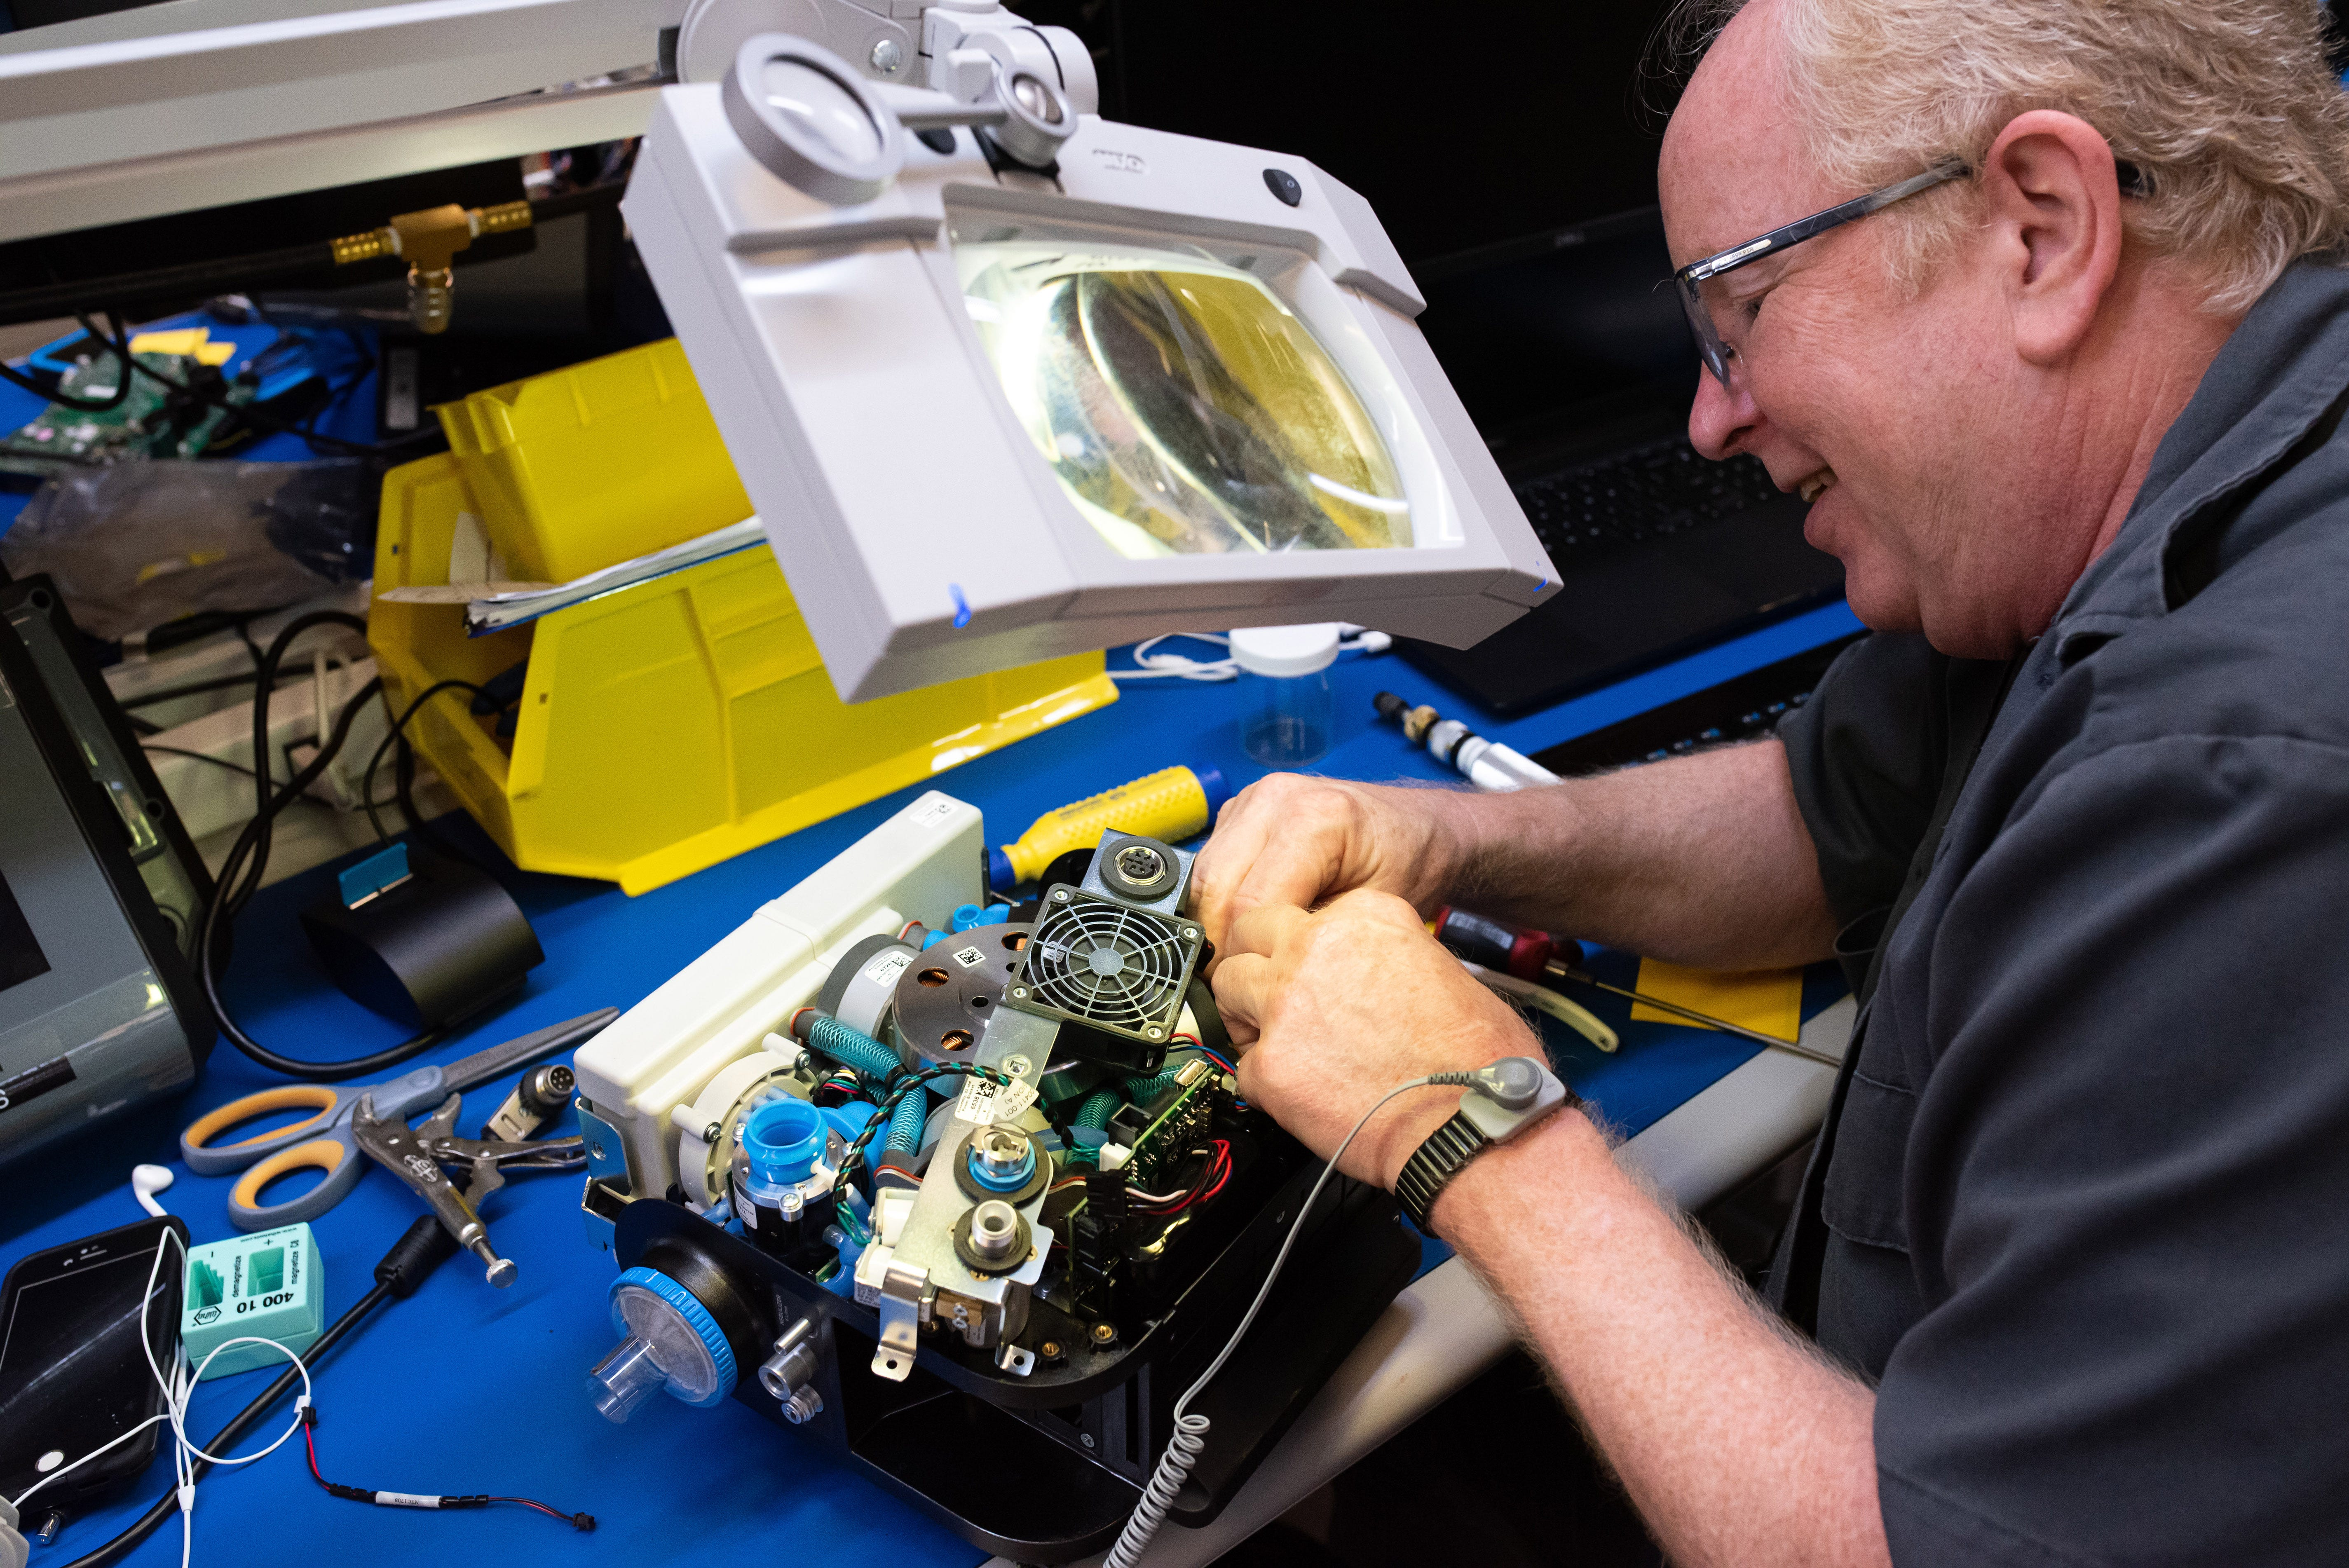 GM to hand off ventilator production to Ventec